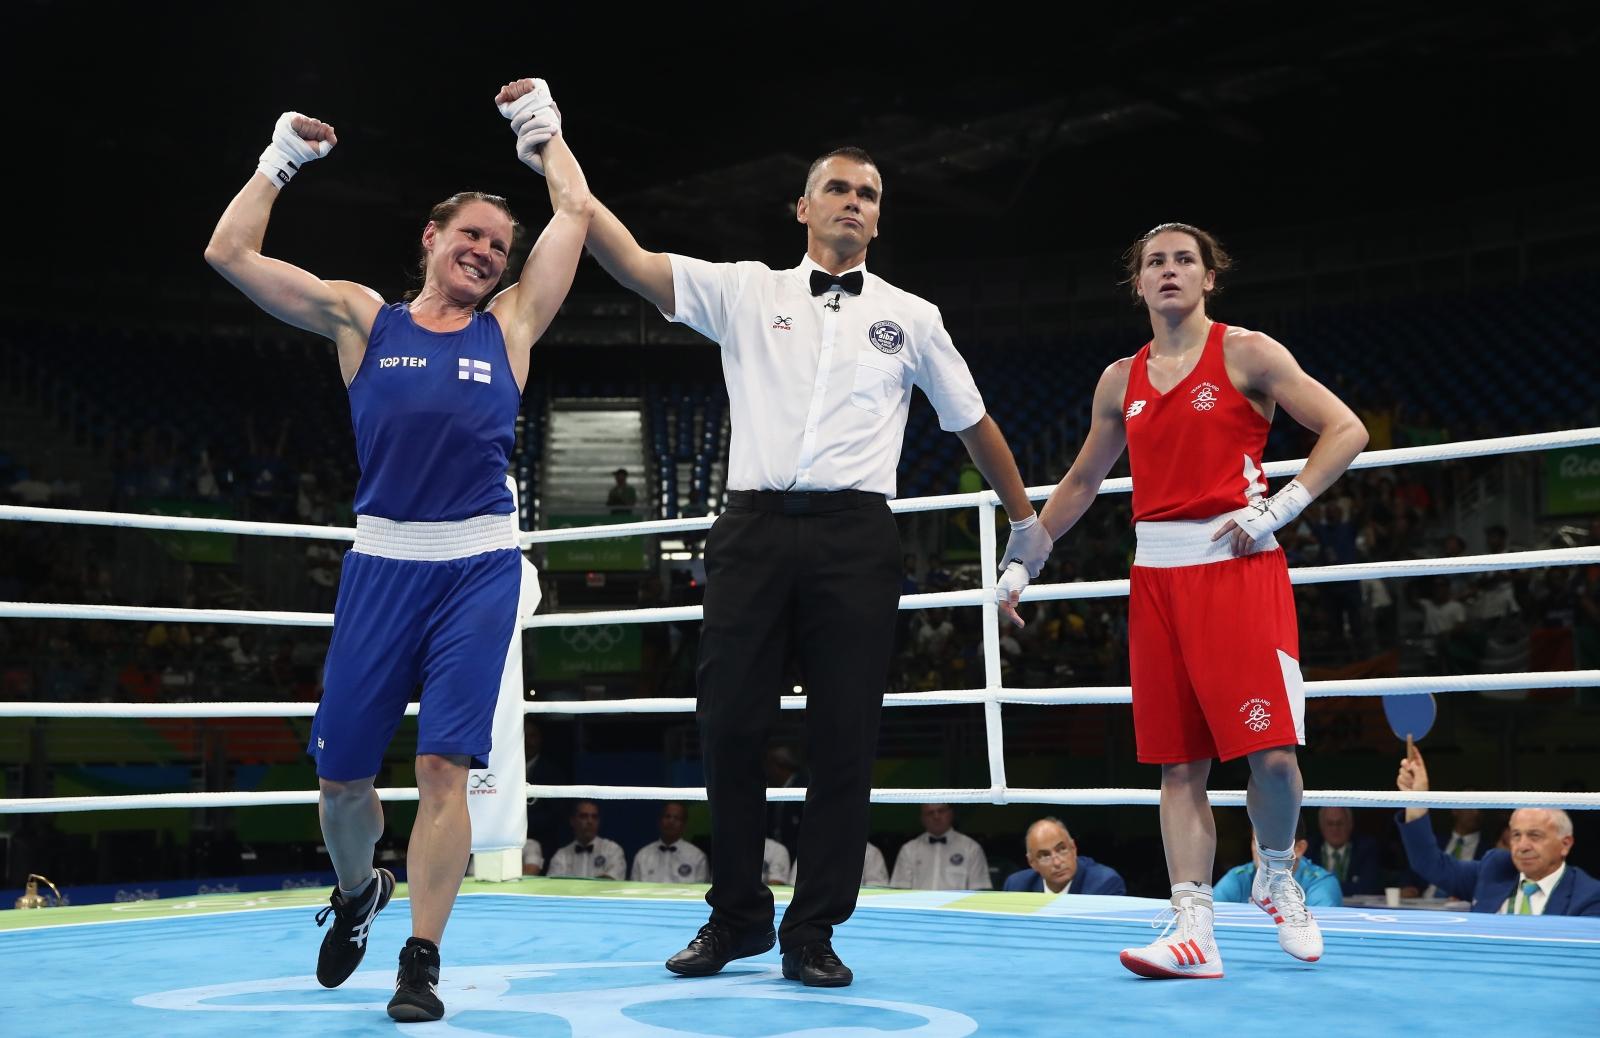 Team USA's Hammer takes silver in women's omnium